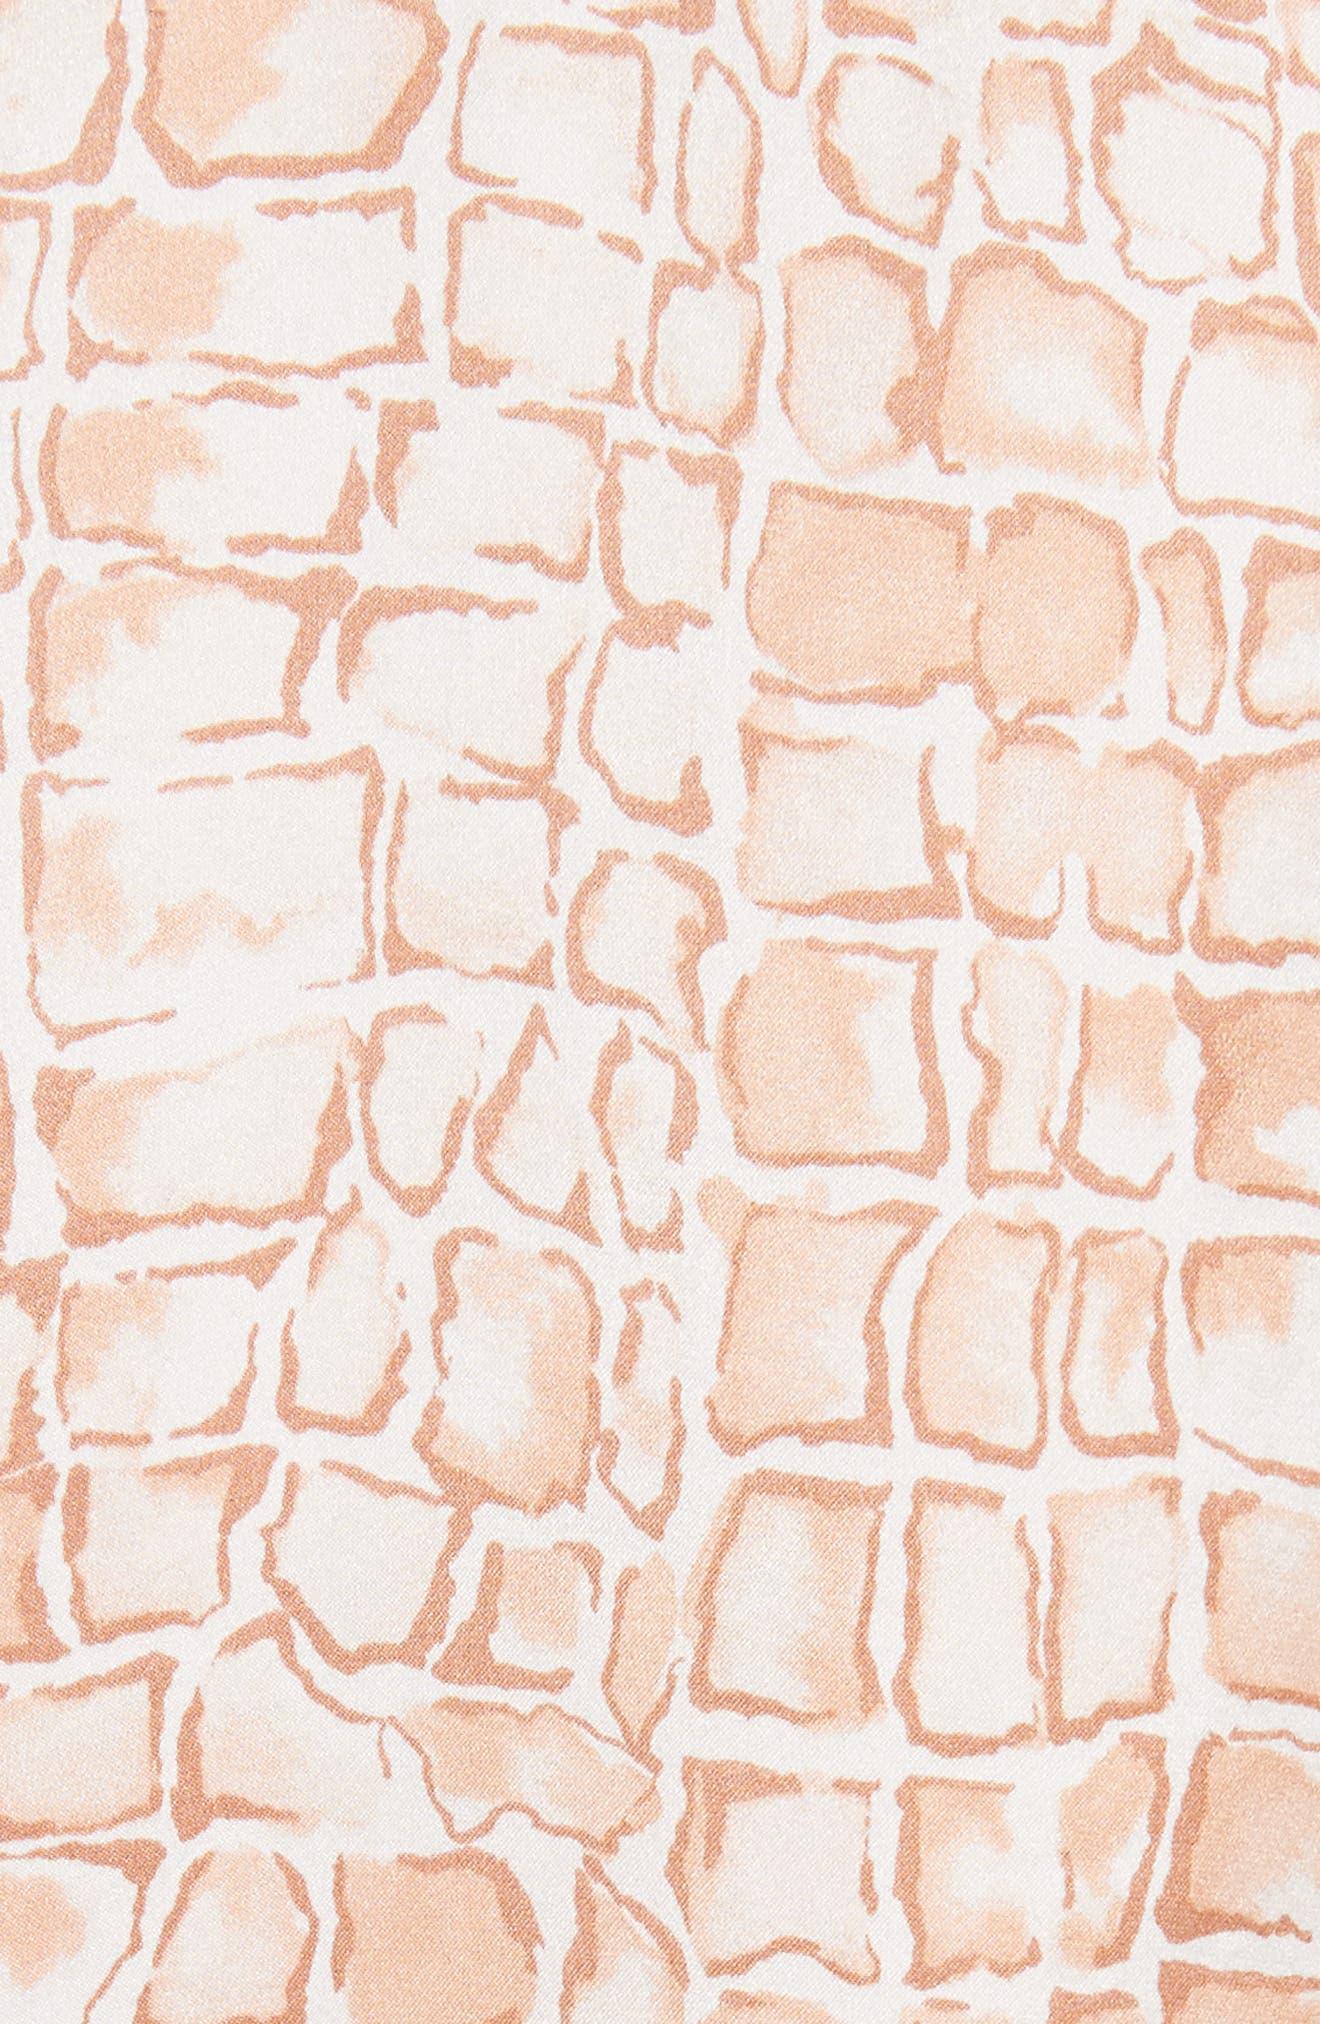 Huntley Silk Blouse,                             Alternate thumbnail 5, color,                             685